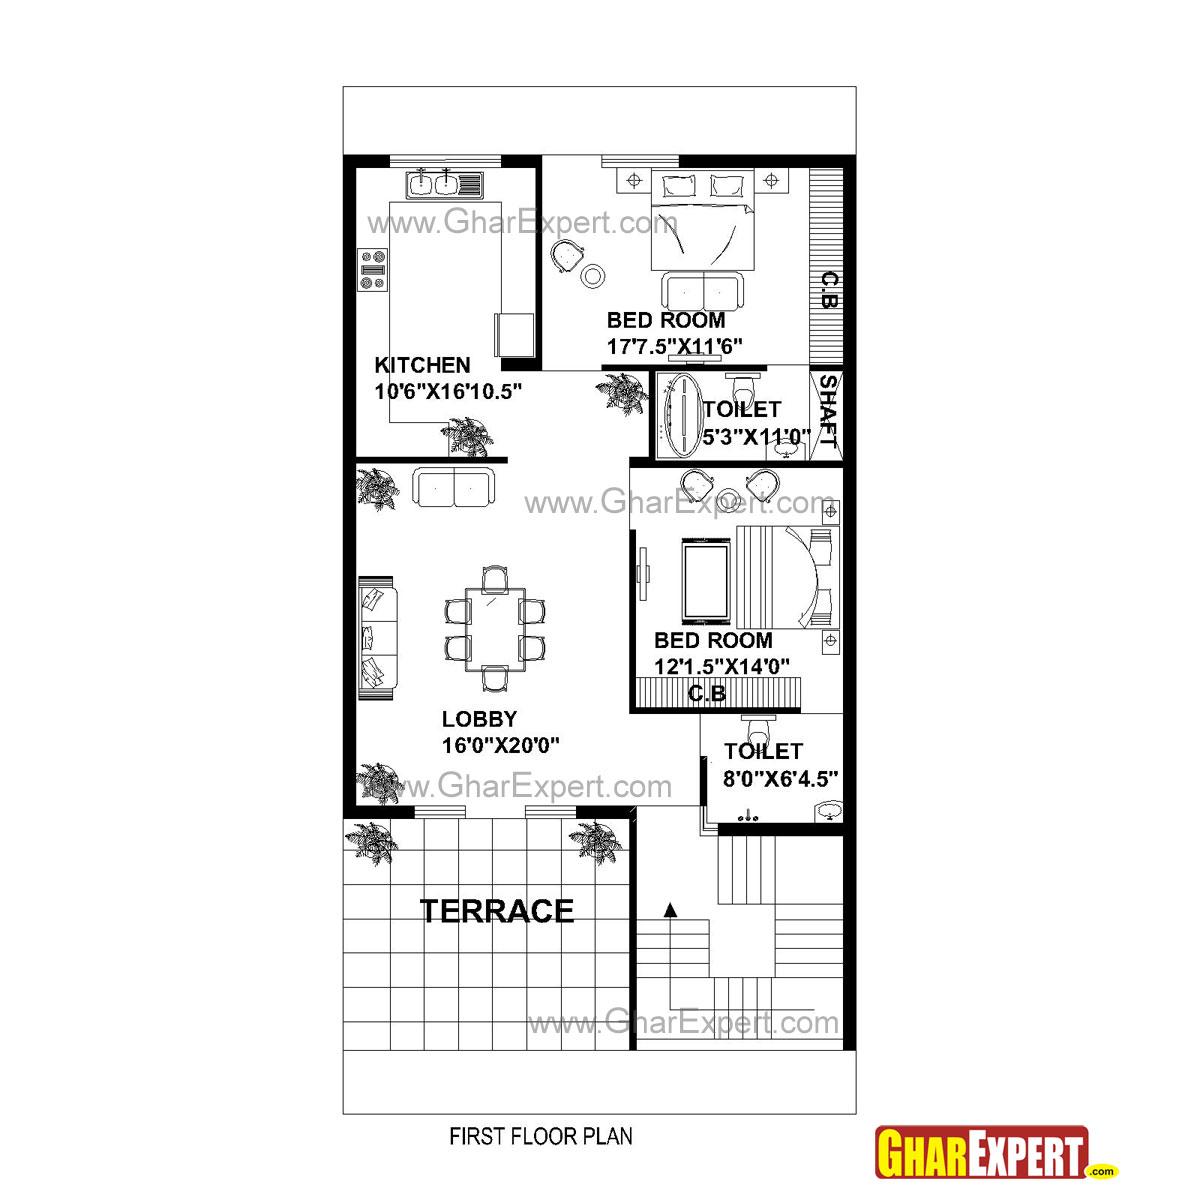 House Plan for 30 Feet by 60 Feet plot (Plot Size 200